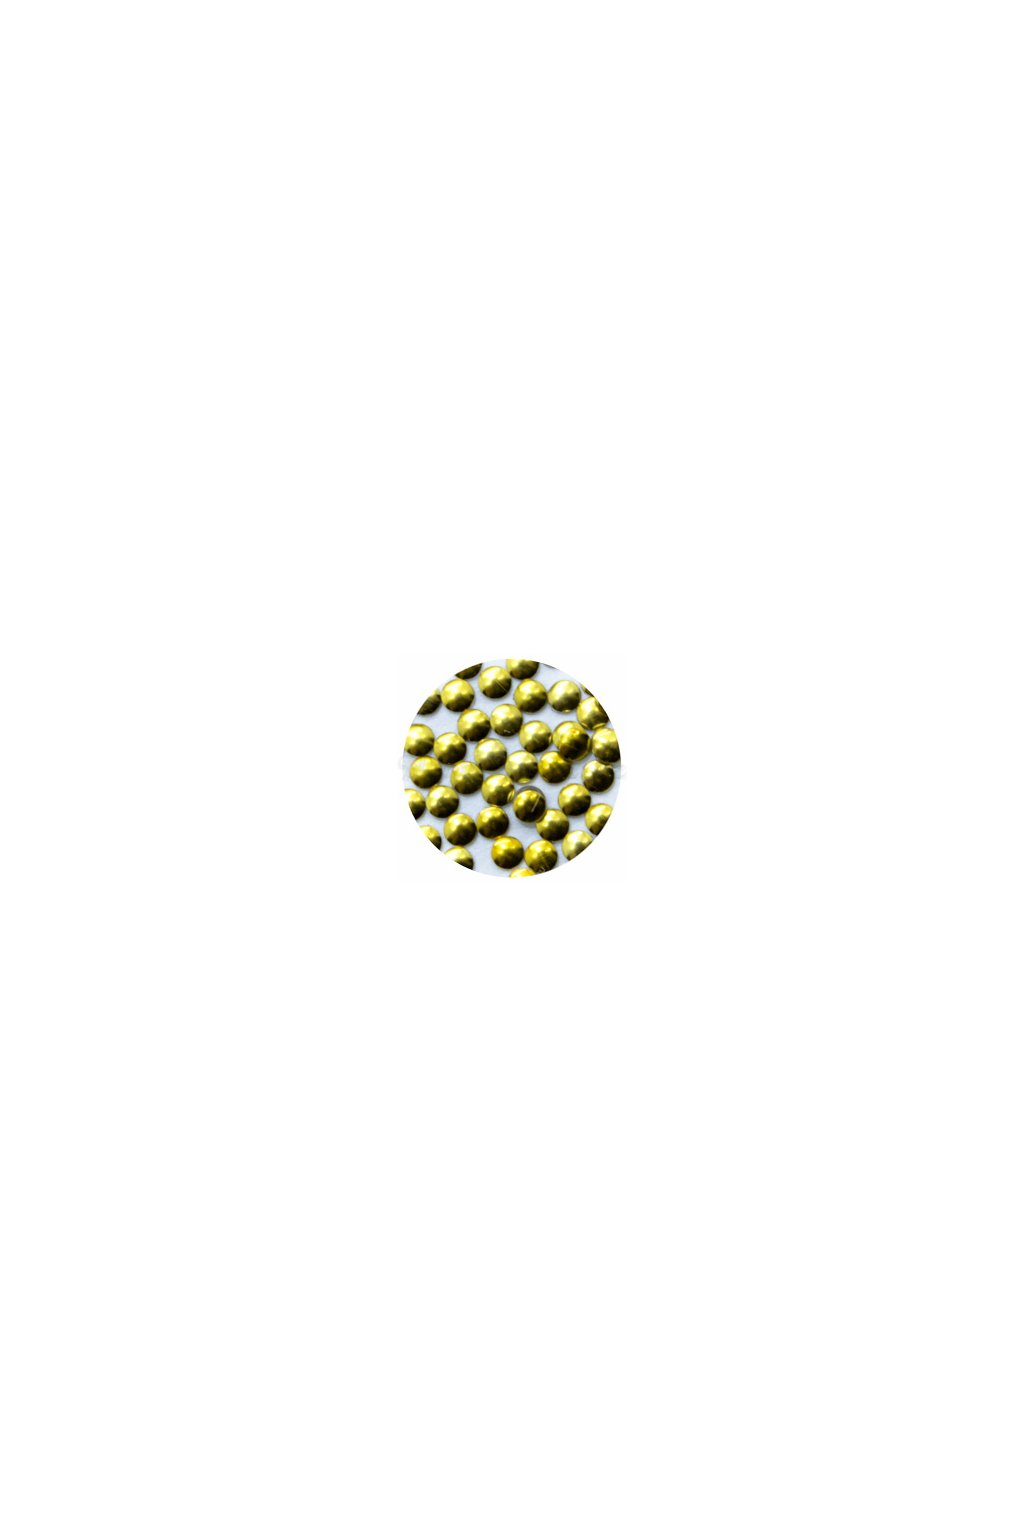 23327 zlate pecky mini